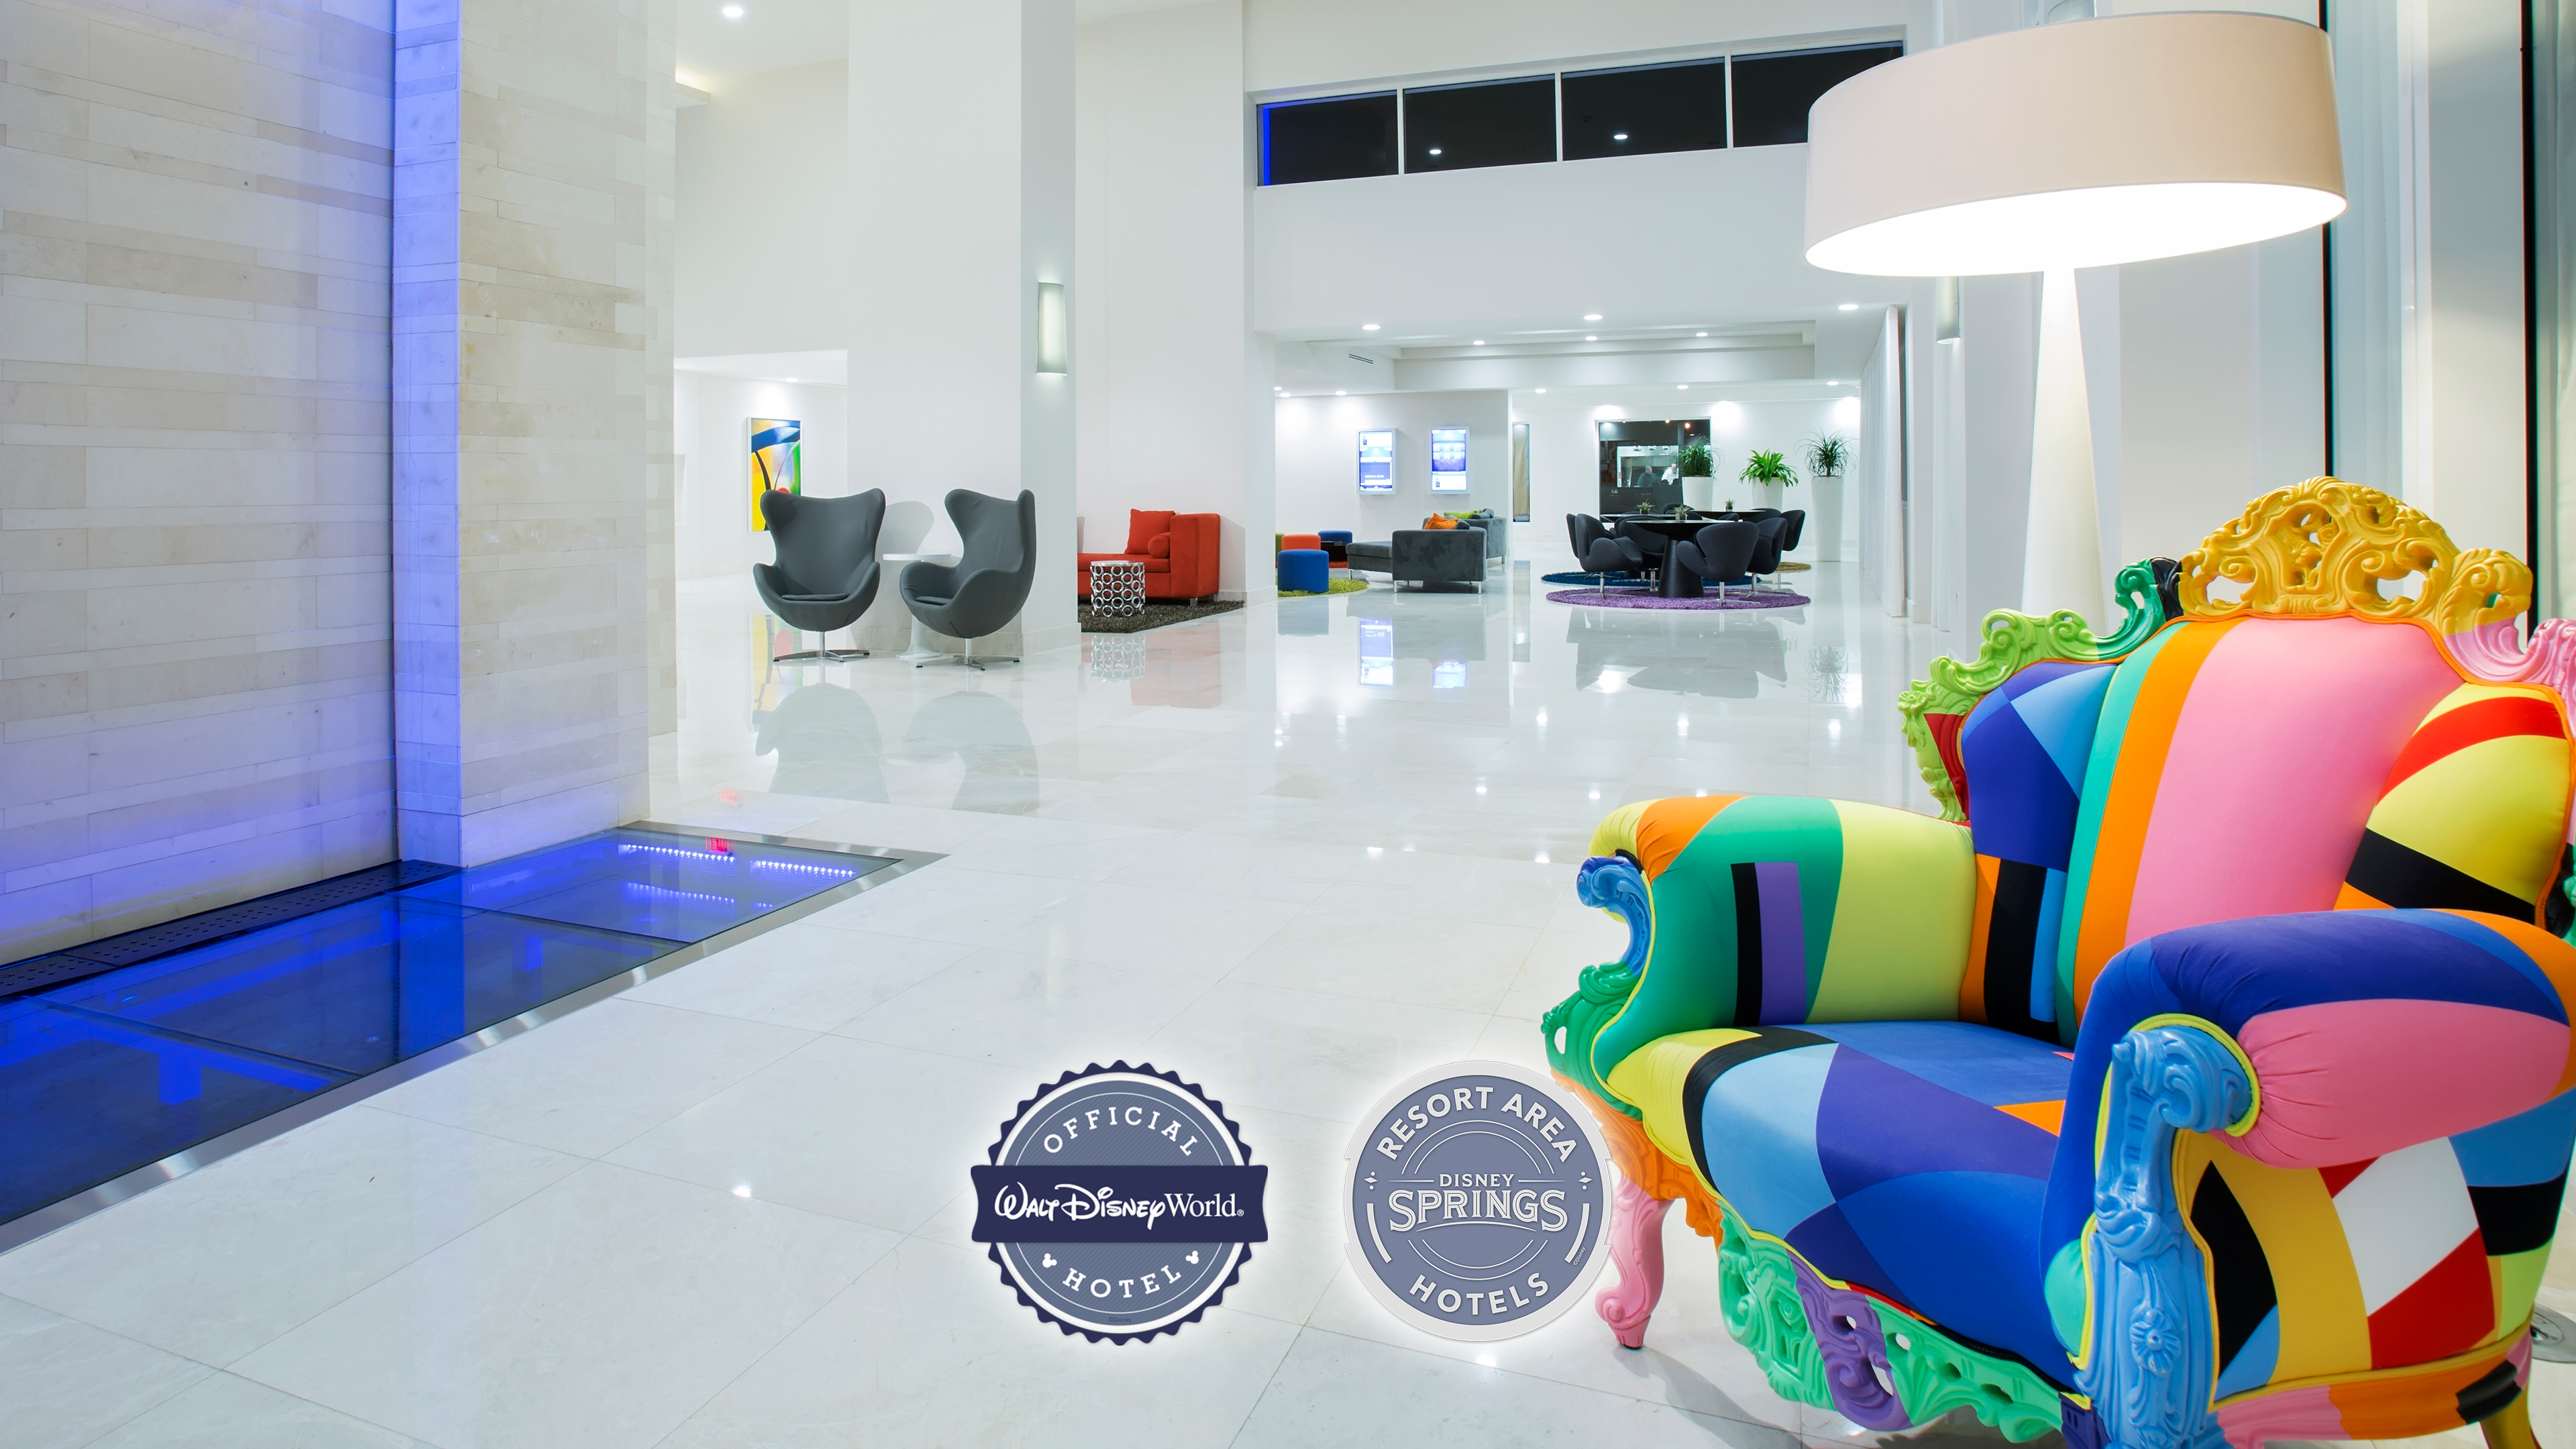 Incredible Hotel Near Disney World Lake Buena Vista B Resort Spa Download Free Architecture Designs Rallybritishbridgeorg